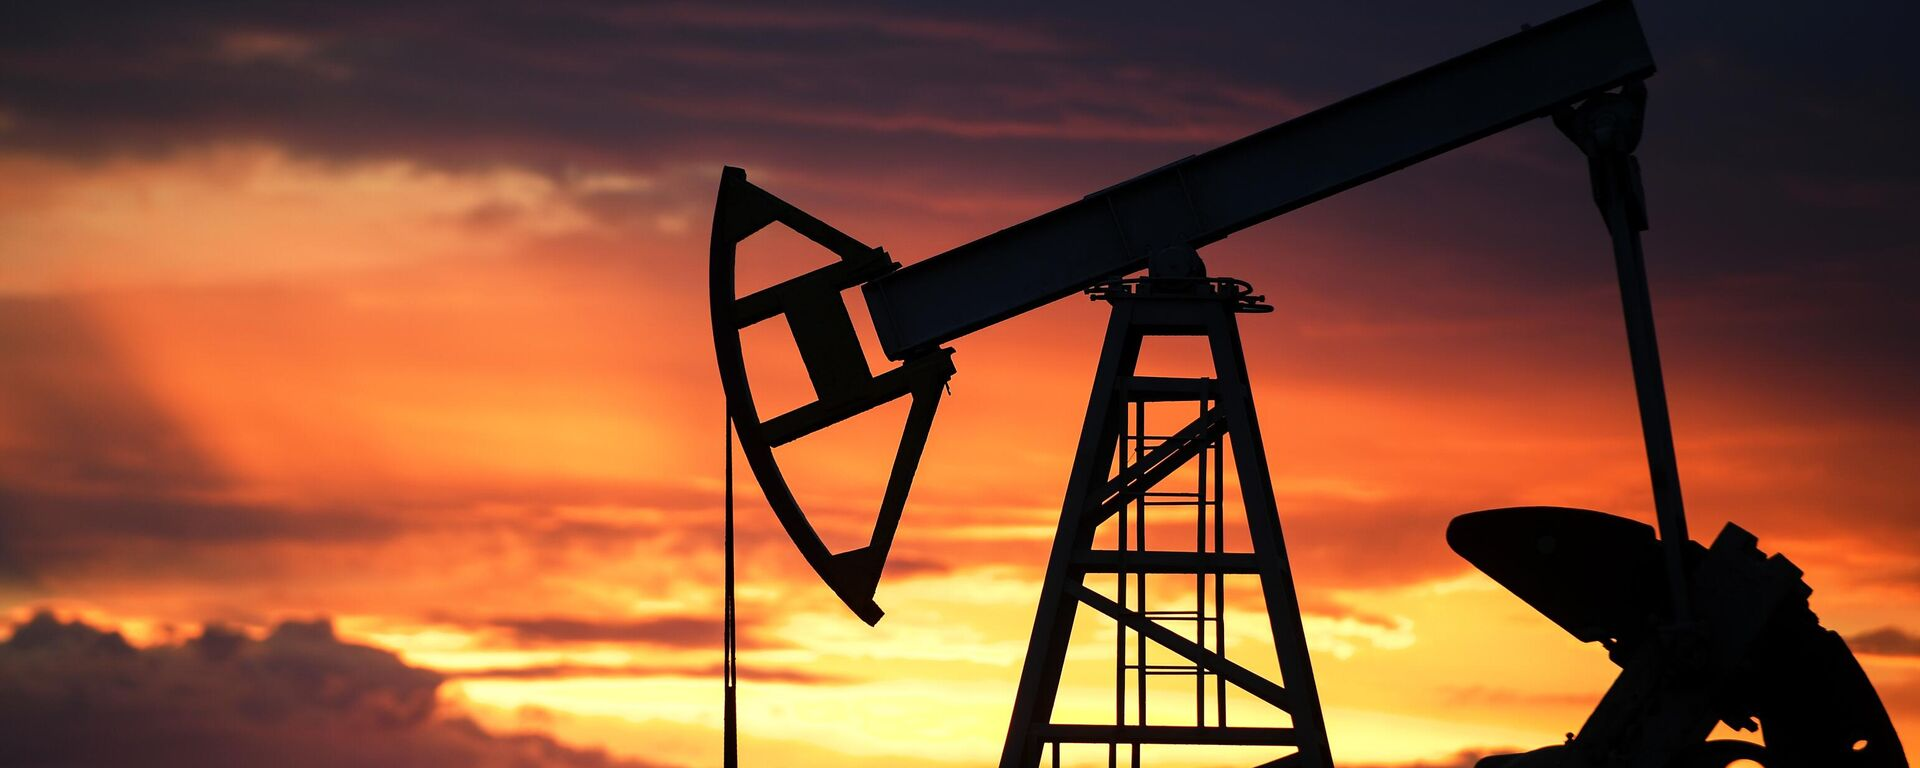 Erdölförderung - SNA, 1920, 18.07.2021